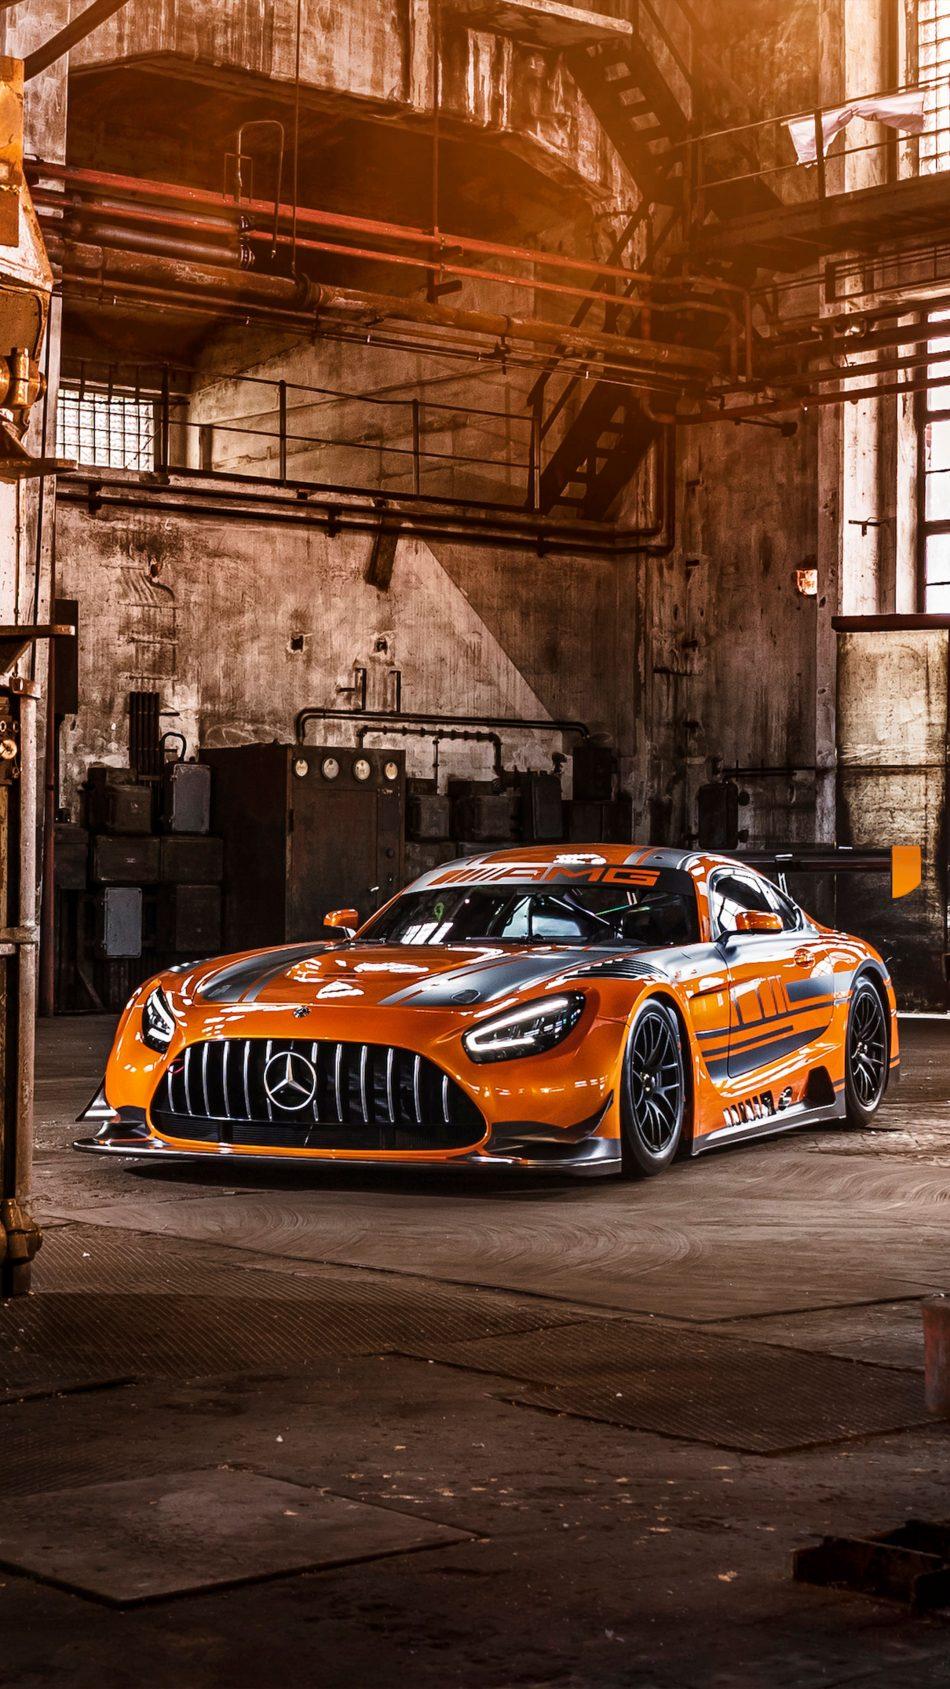 Mercedes AMG GT3 2019 4K Ultra HD Mobile Wallpaper